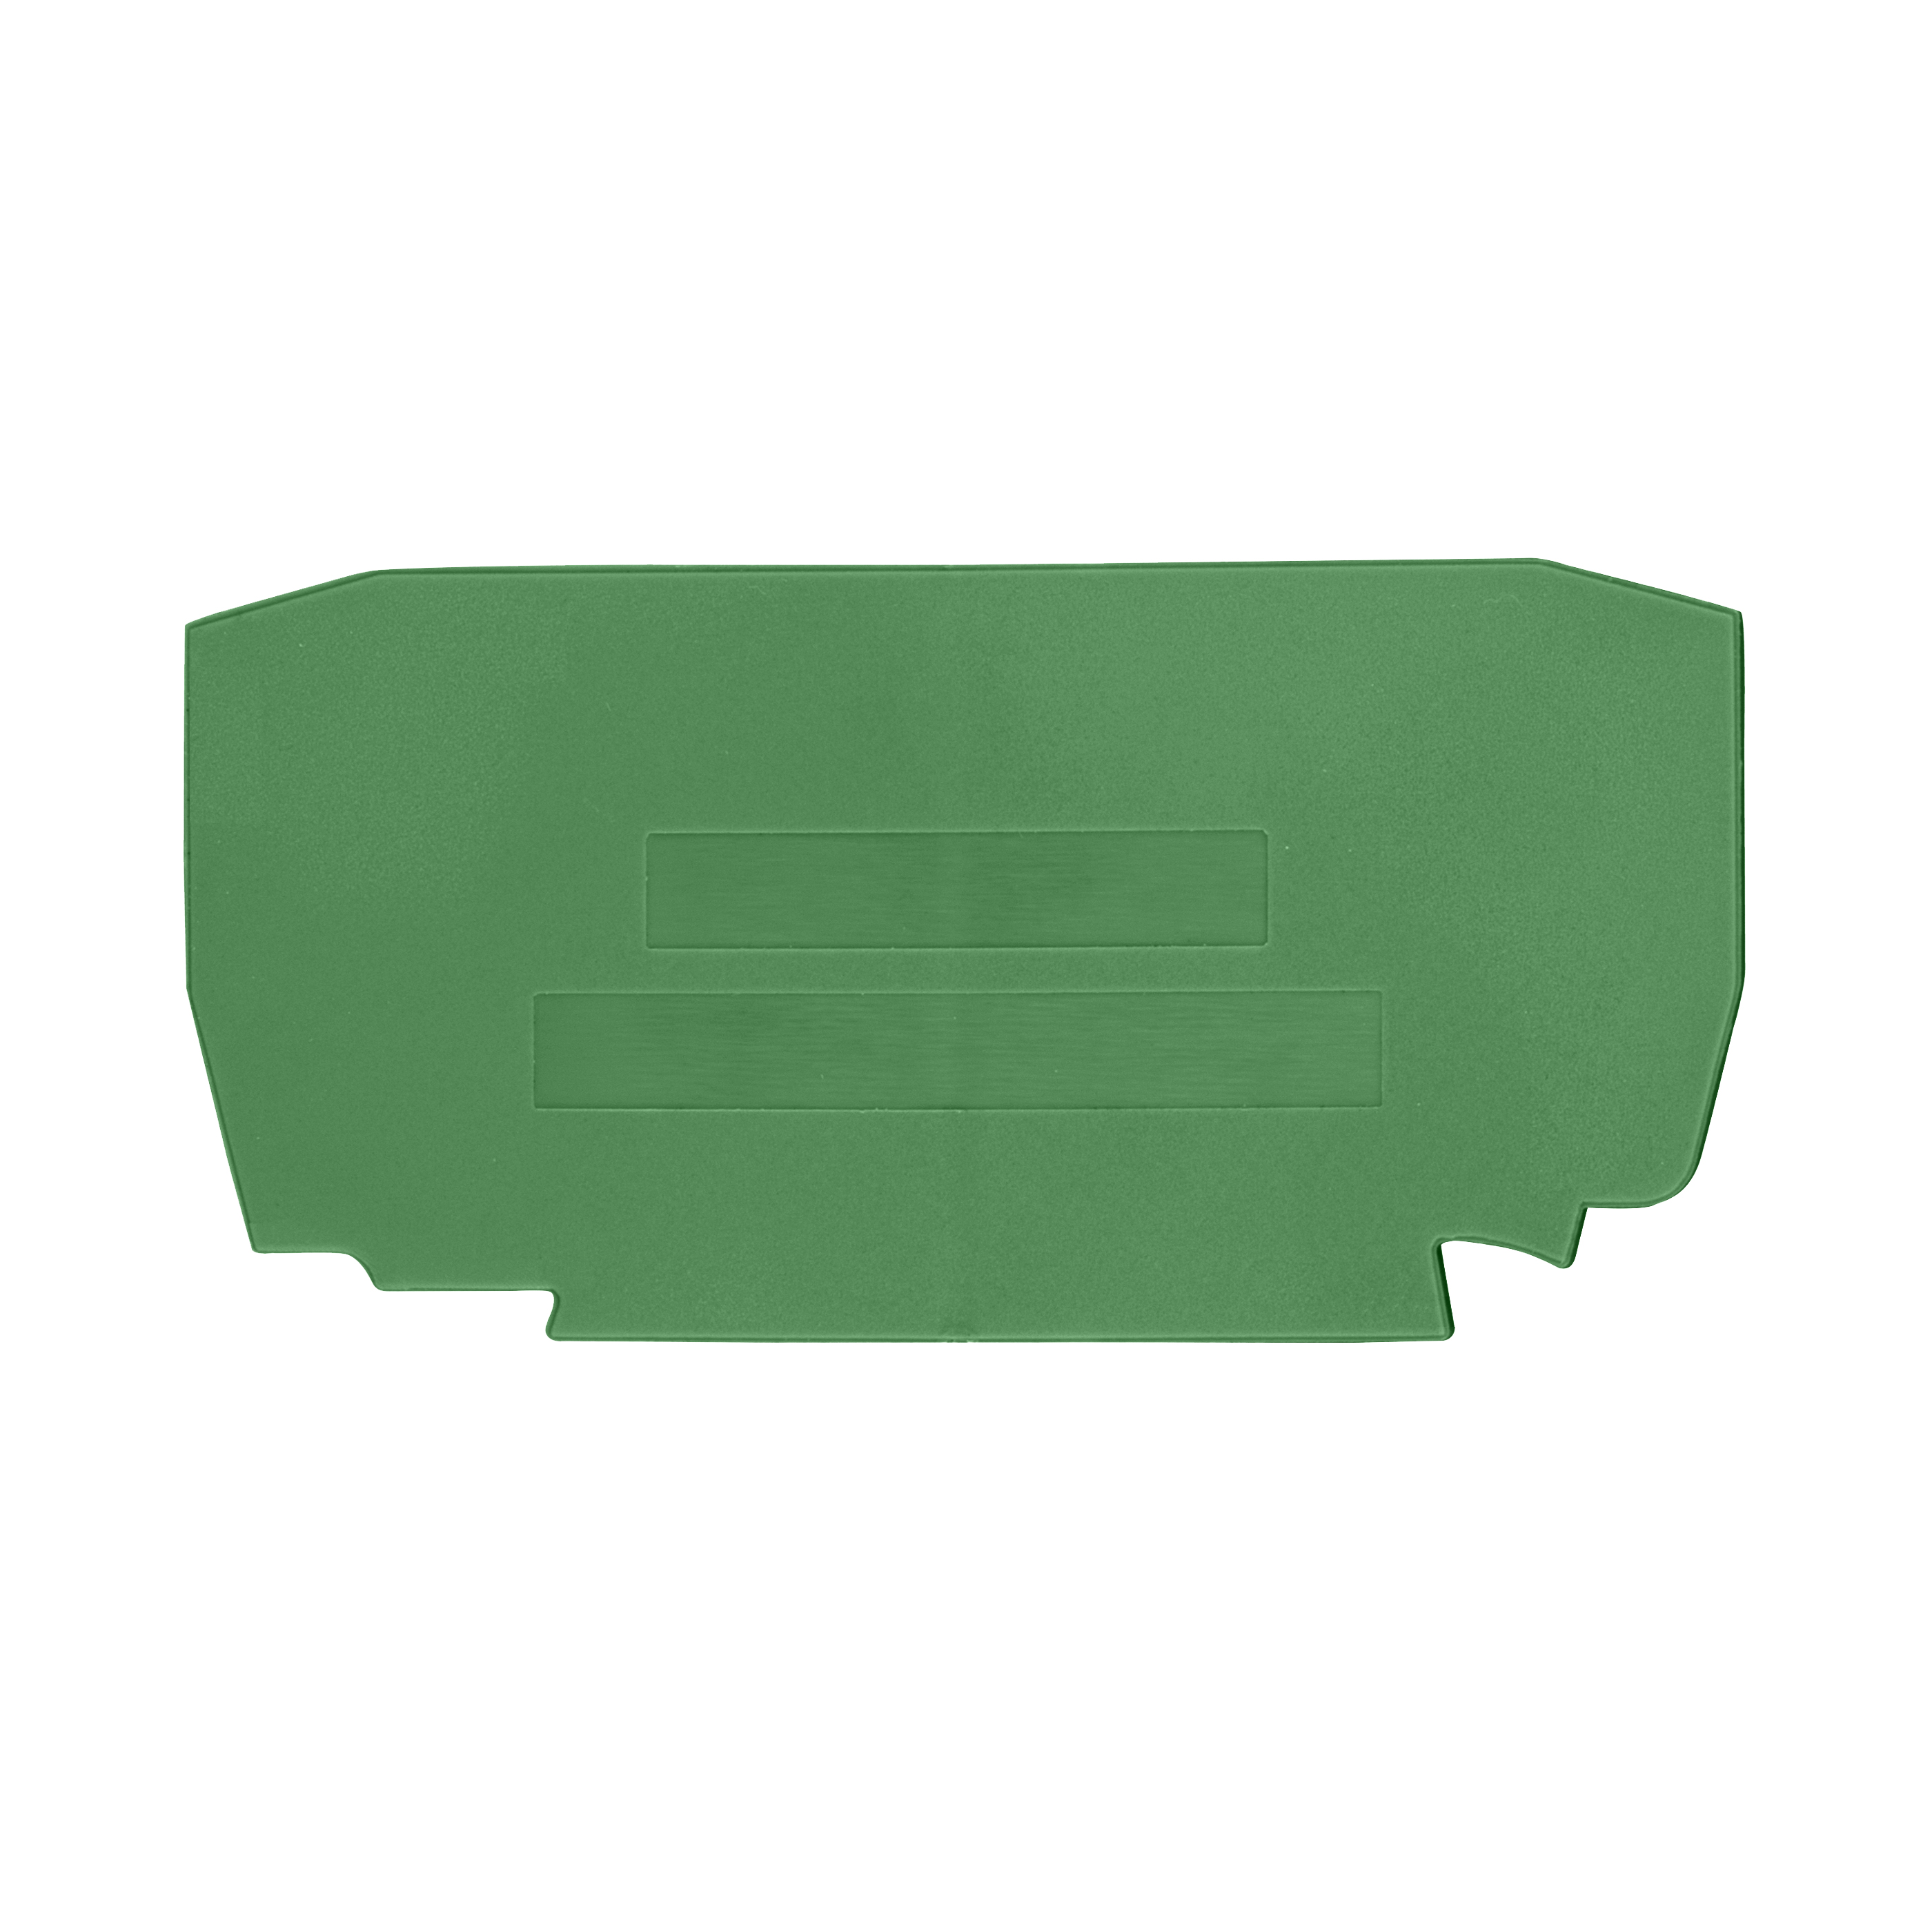 1 Stk Endplatte für Federkraftklemme YBK 4 T grün IK632204--